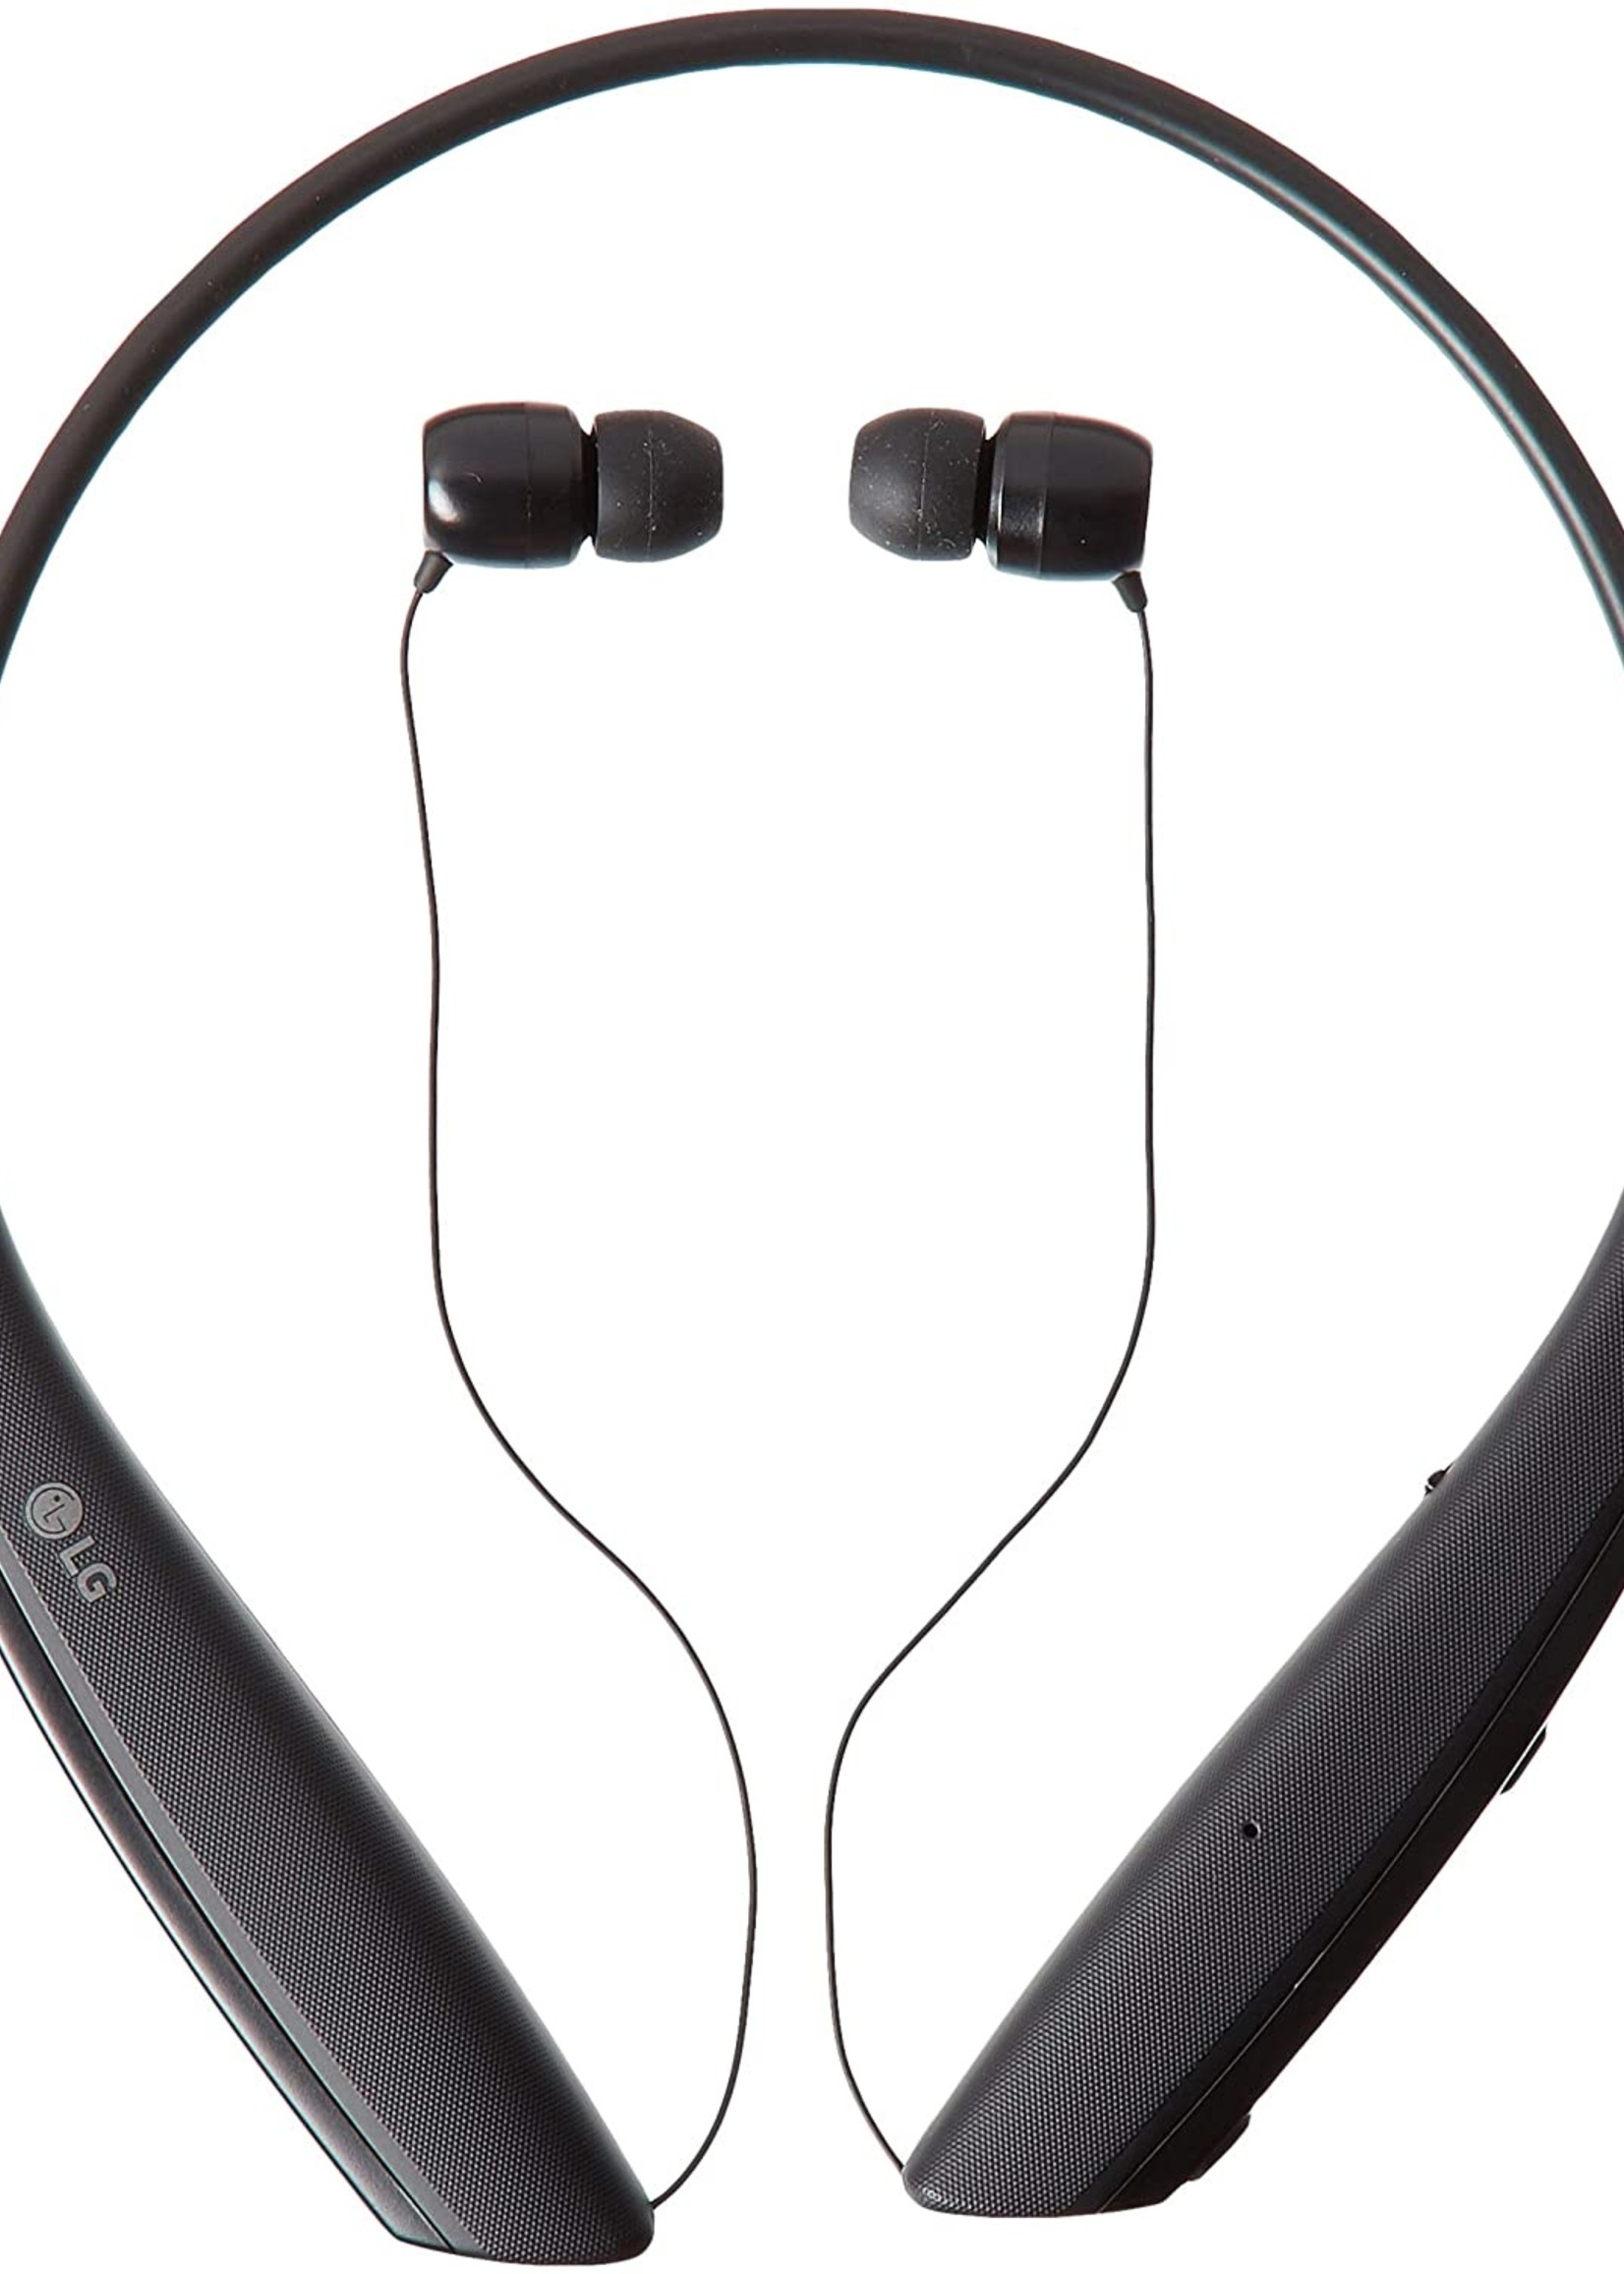 LG LG Tone Ultra Bluetooth Stereo Headset Black